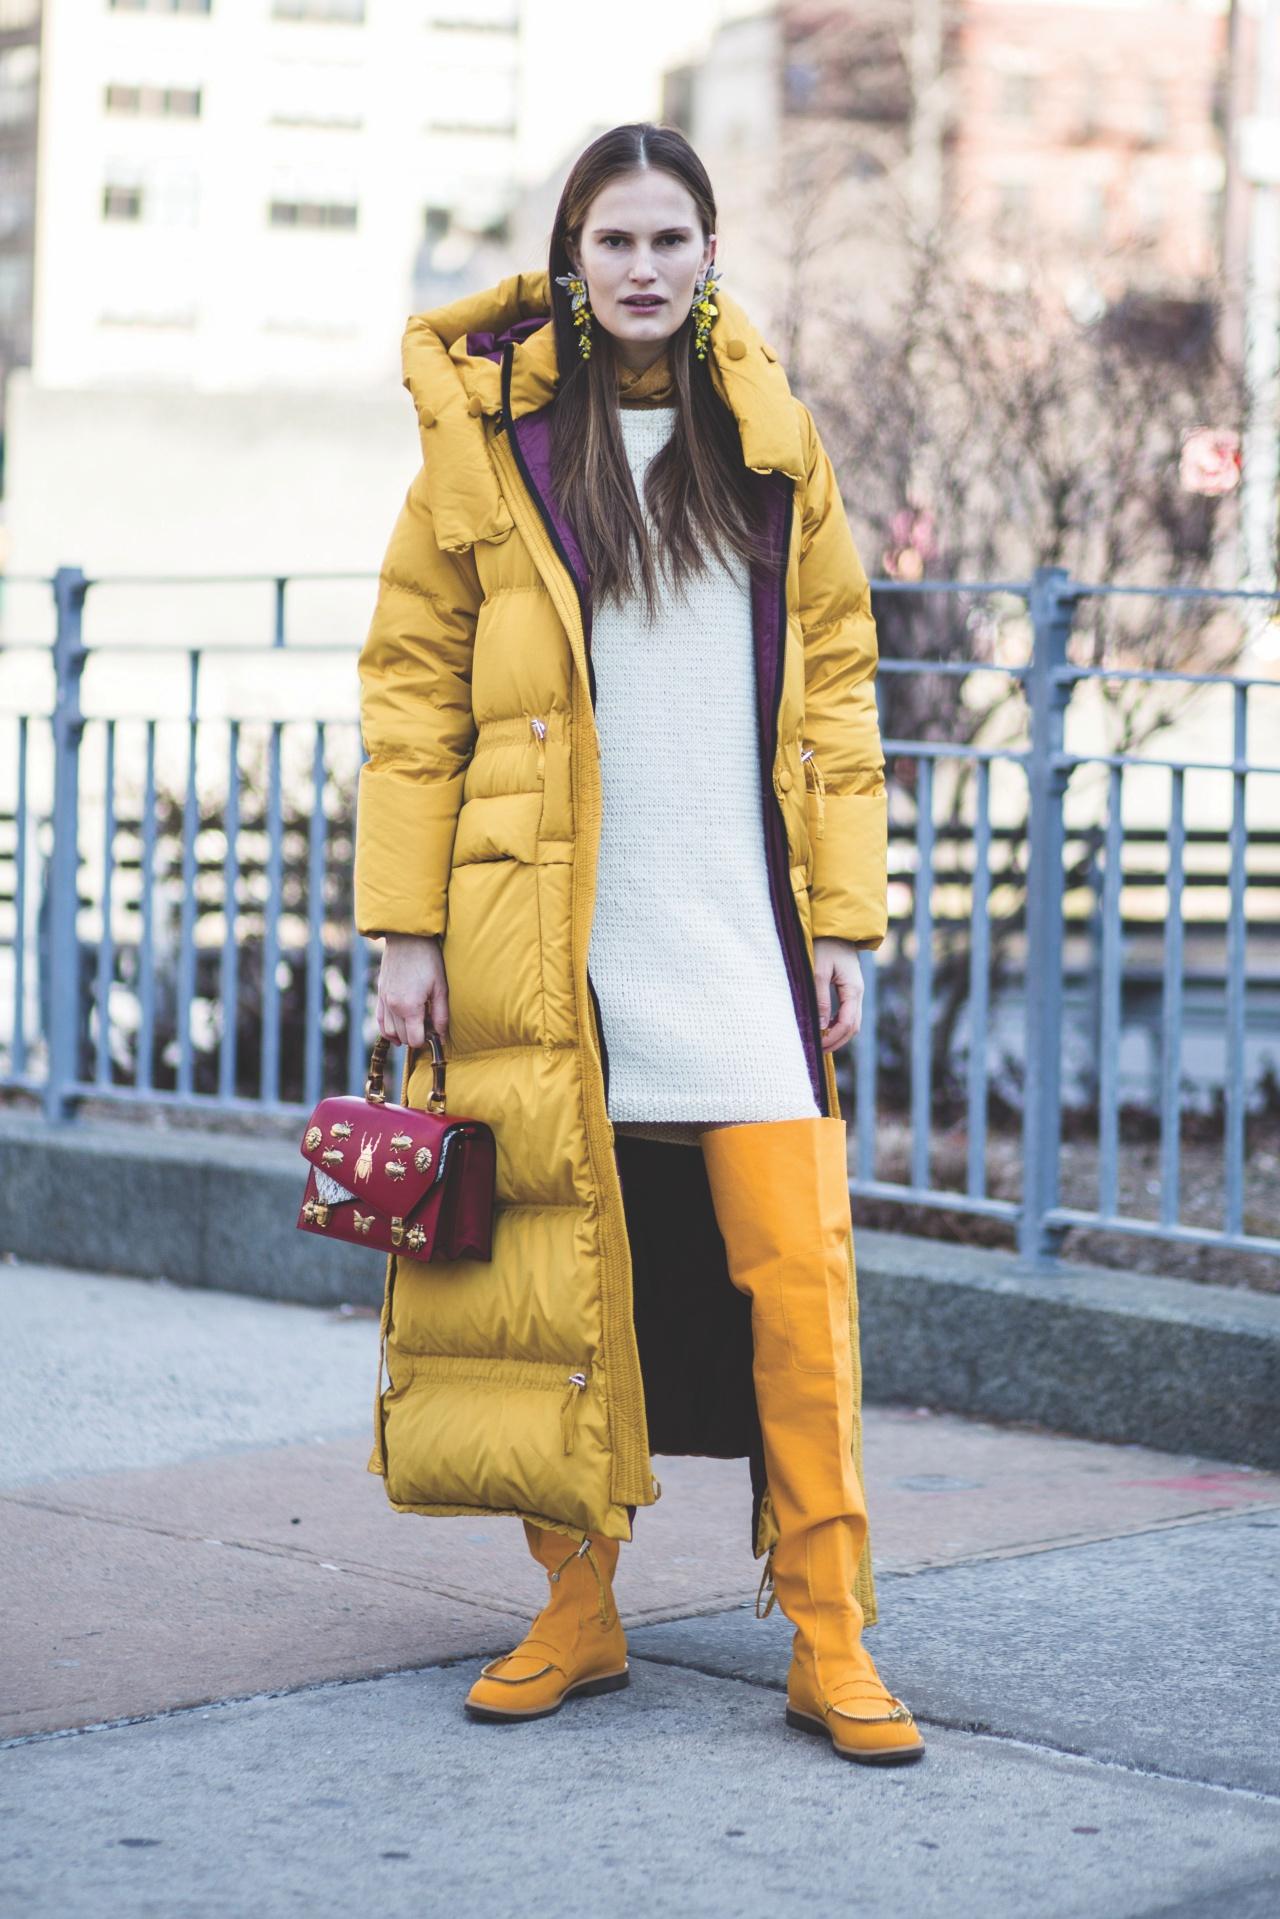 Pixelformula  Women's Ready to Wear Autumn/Winter 2018/2019 - New York Street Fashion NY 2018